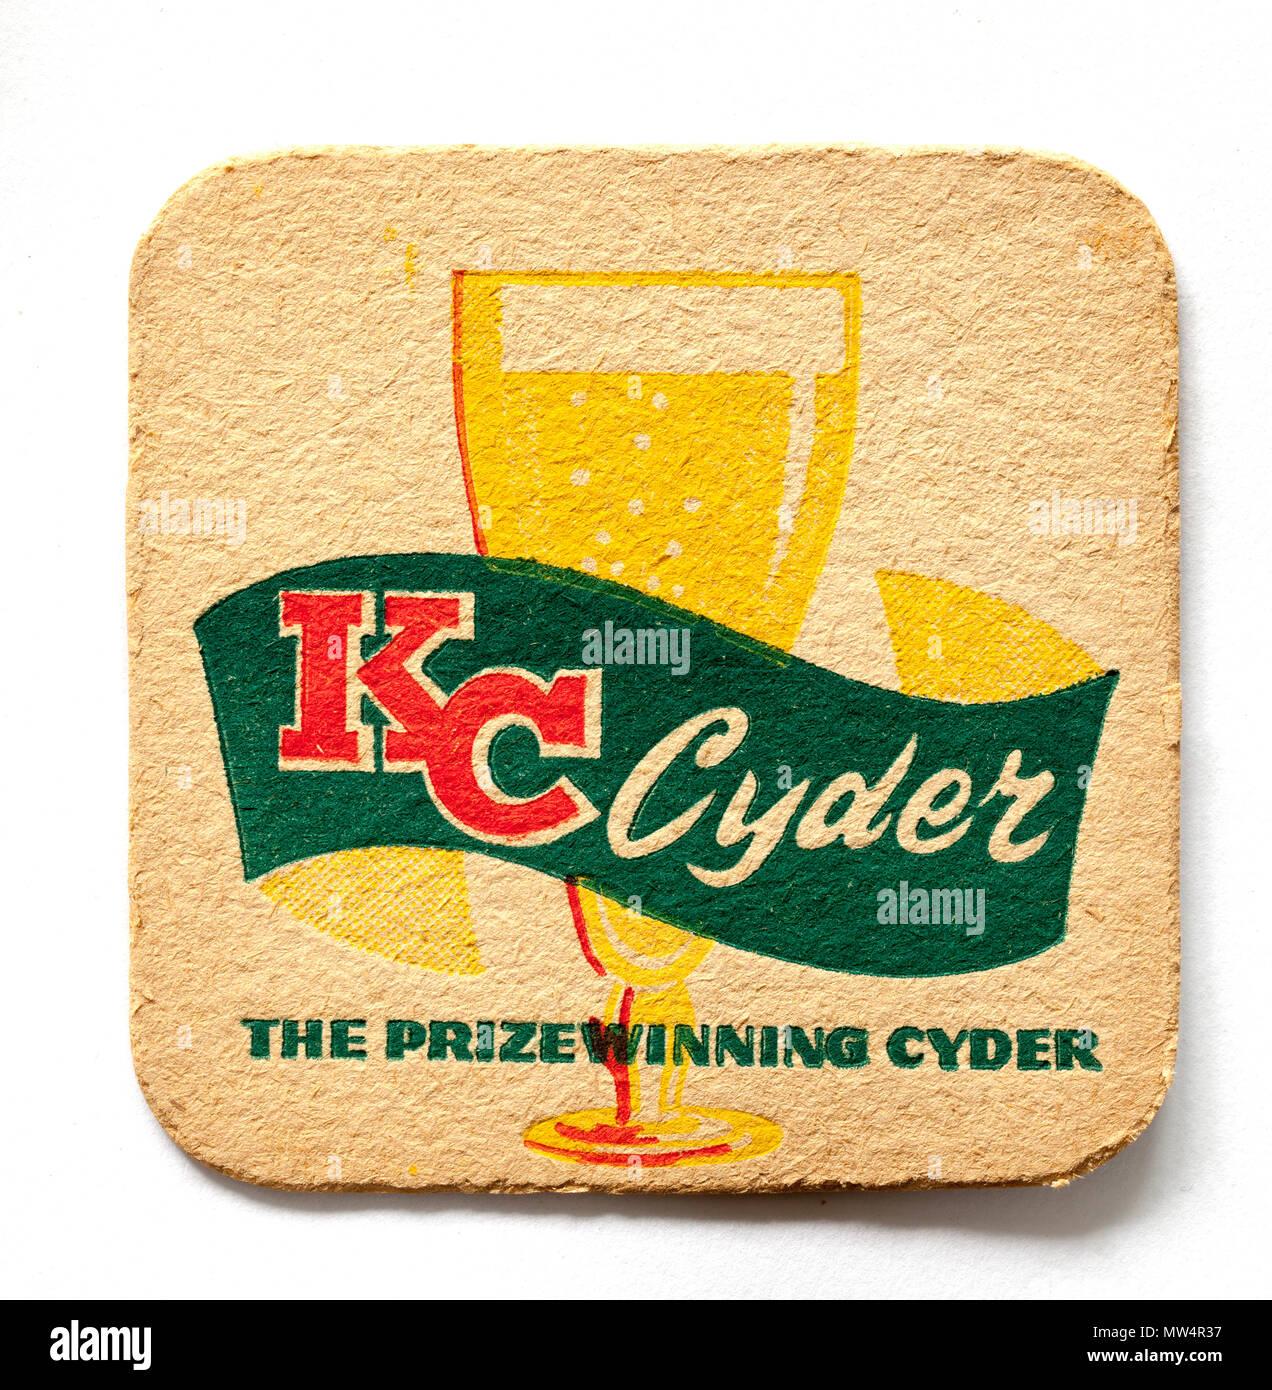 Old Vintage British Beer Mat Advertising KC Cyder - Stock Image